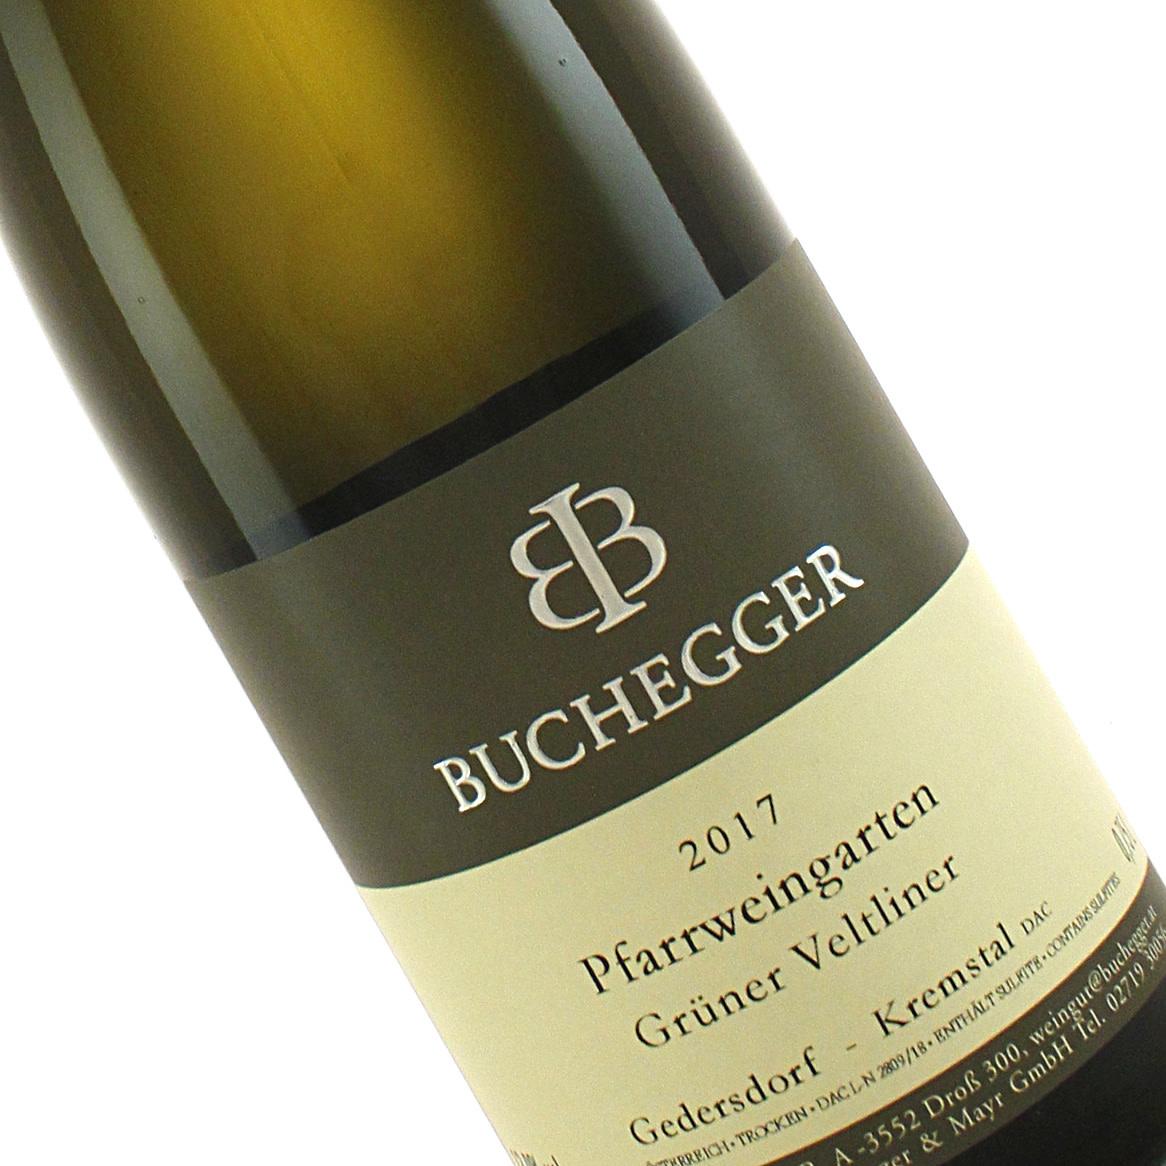 Buchegger 2017 Gruner Veltliner Pfarrweingarten, Kremstal Austria